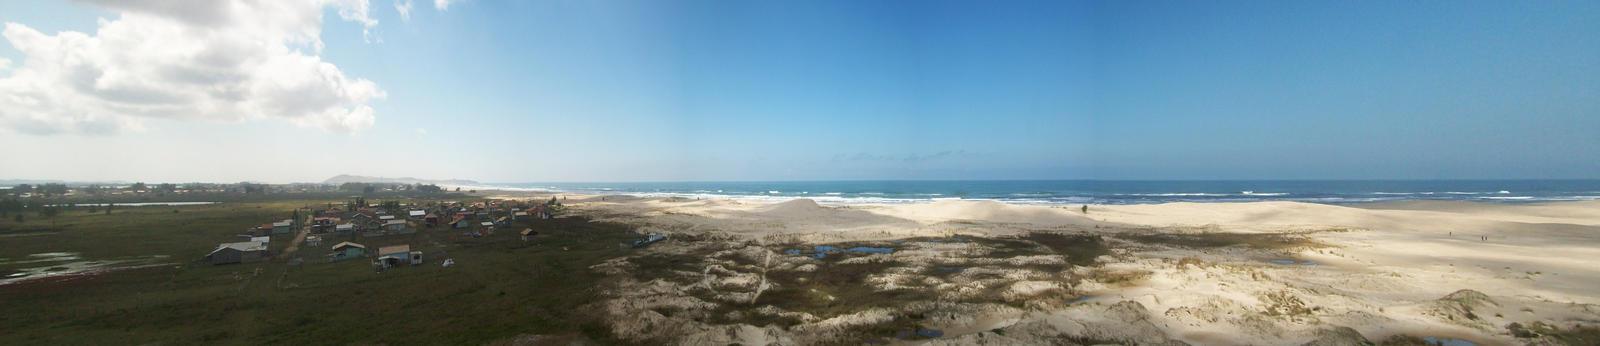 Sambaqui Dunes - Camacho, SC, Brazil (Panorama 1) by Ishtaryu